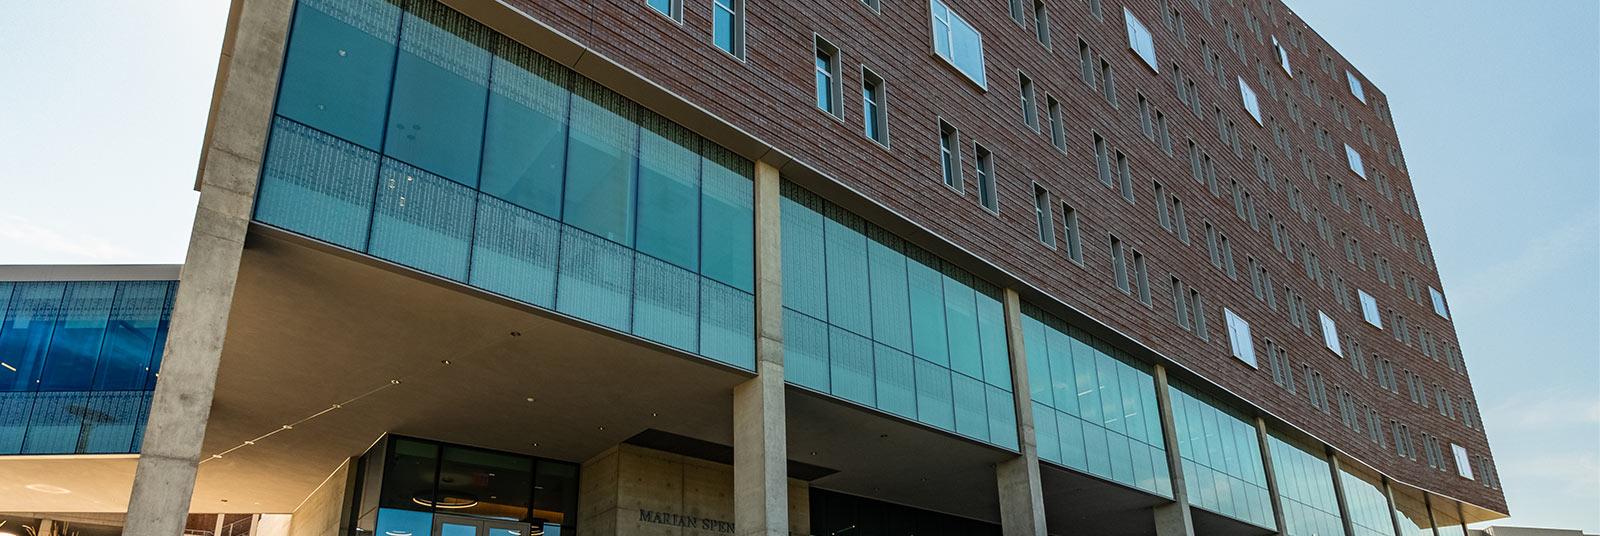 University of Cincinnati Marian Spencer Hall in Cincinnati, Ohio.